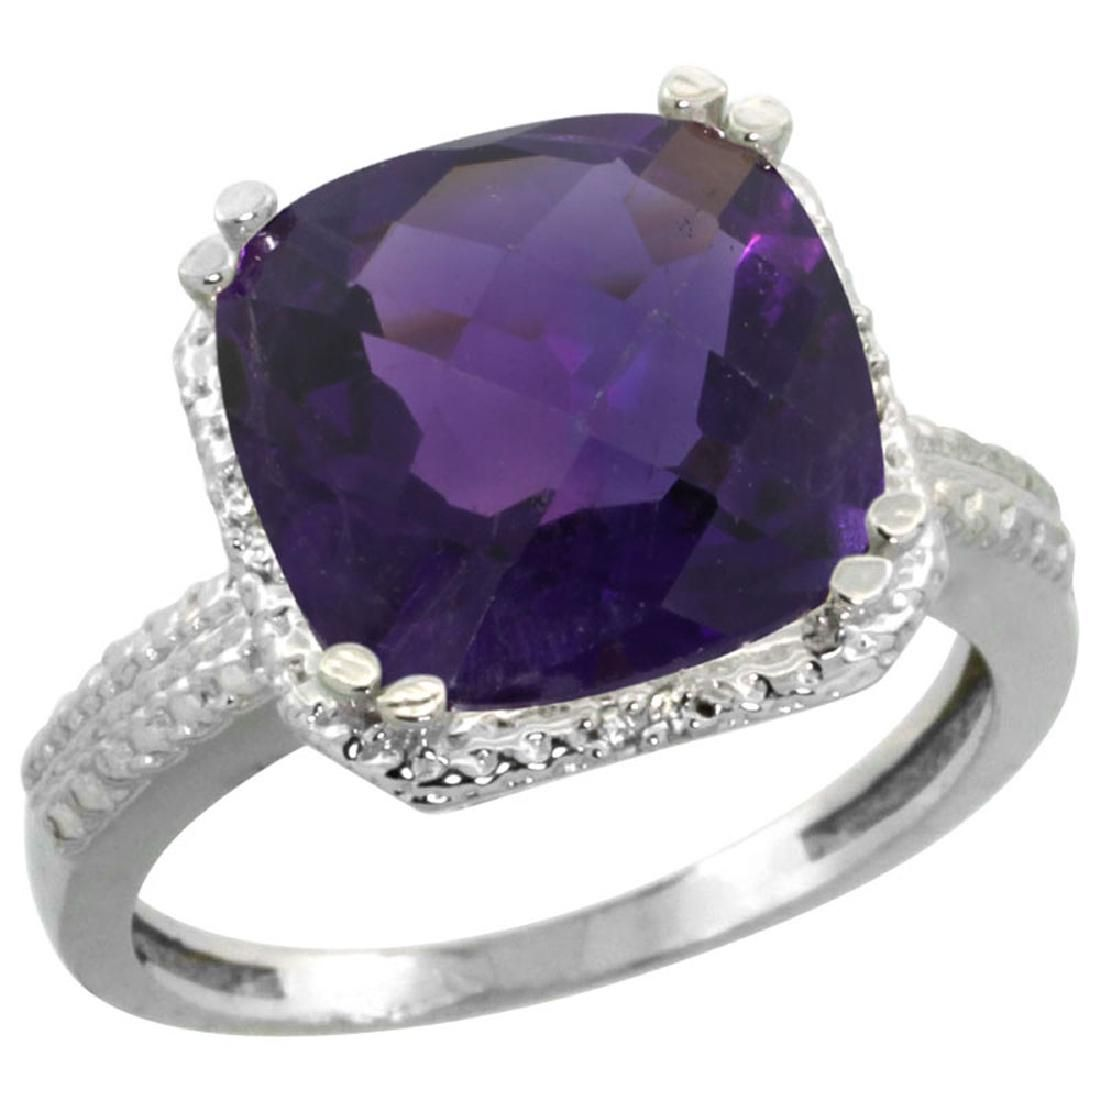 Natural 5.96 ctw Amethyst & Diamond Engagement Ring 14K